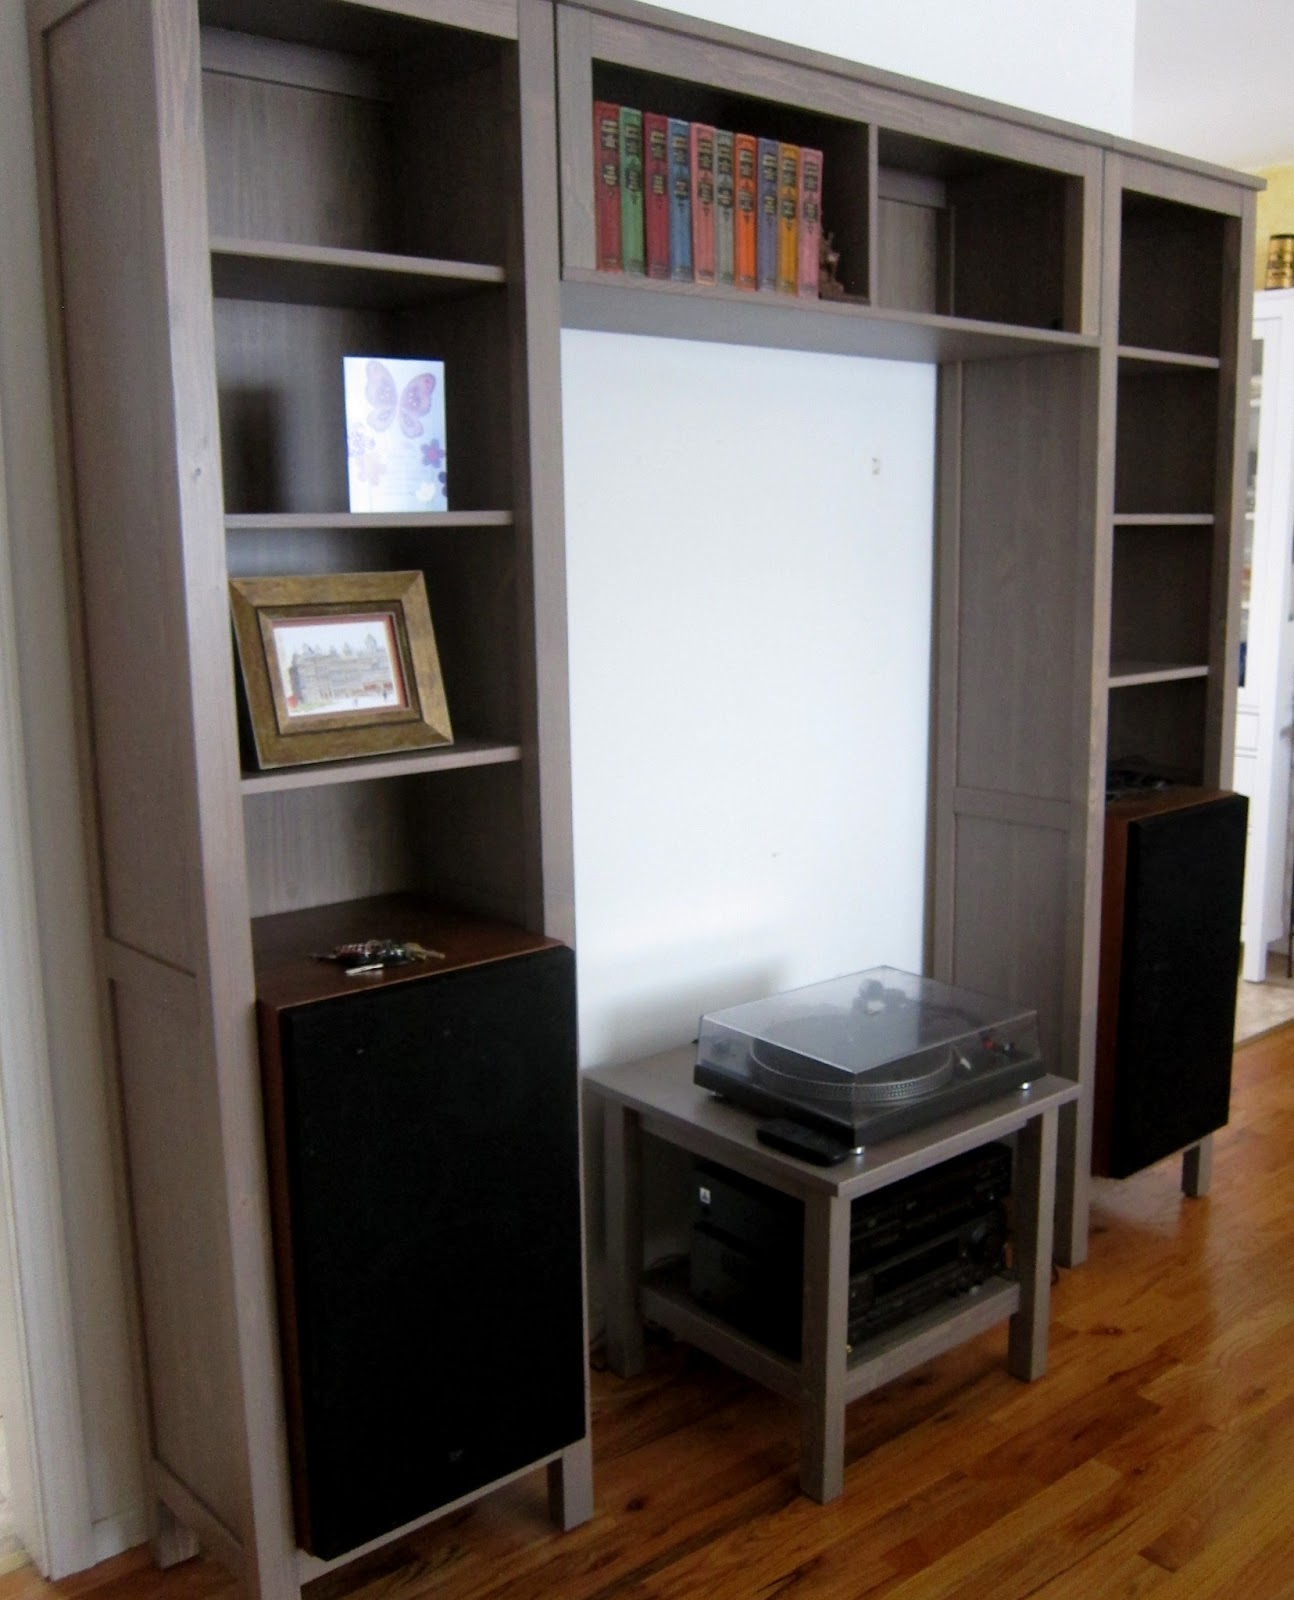 deanna 39 s weaving new year update. Black Bedroom Furniture Sets. Home Design Ideas